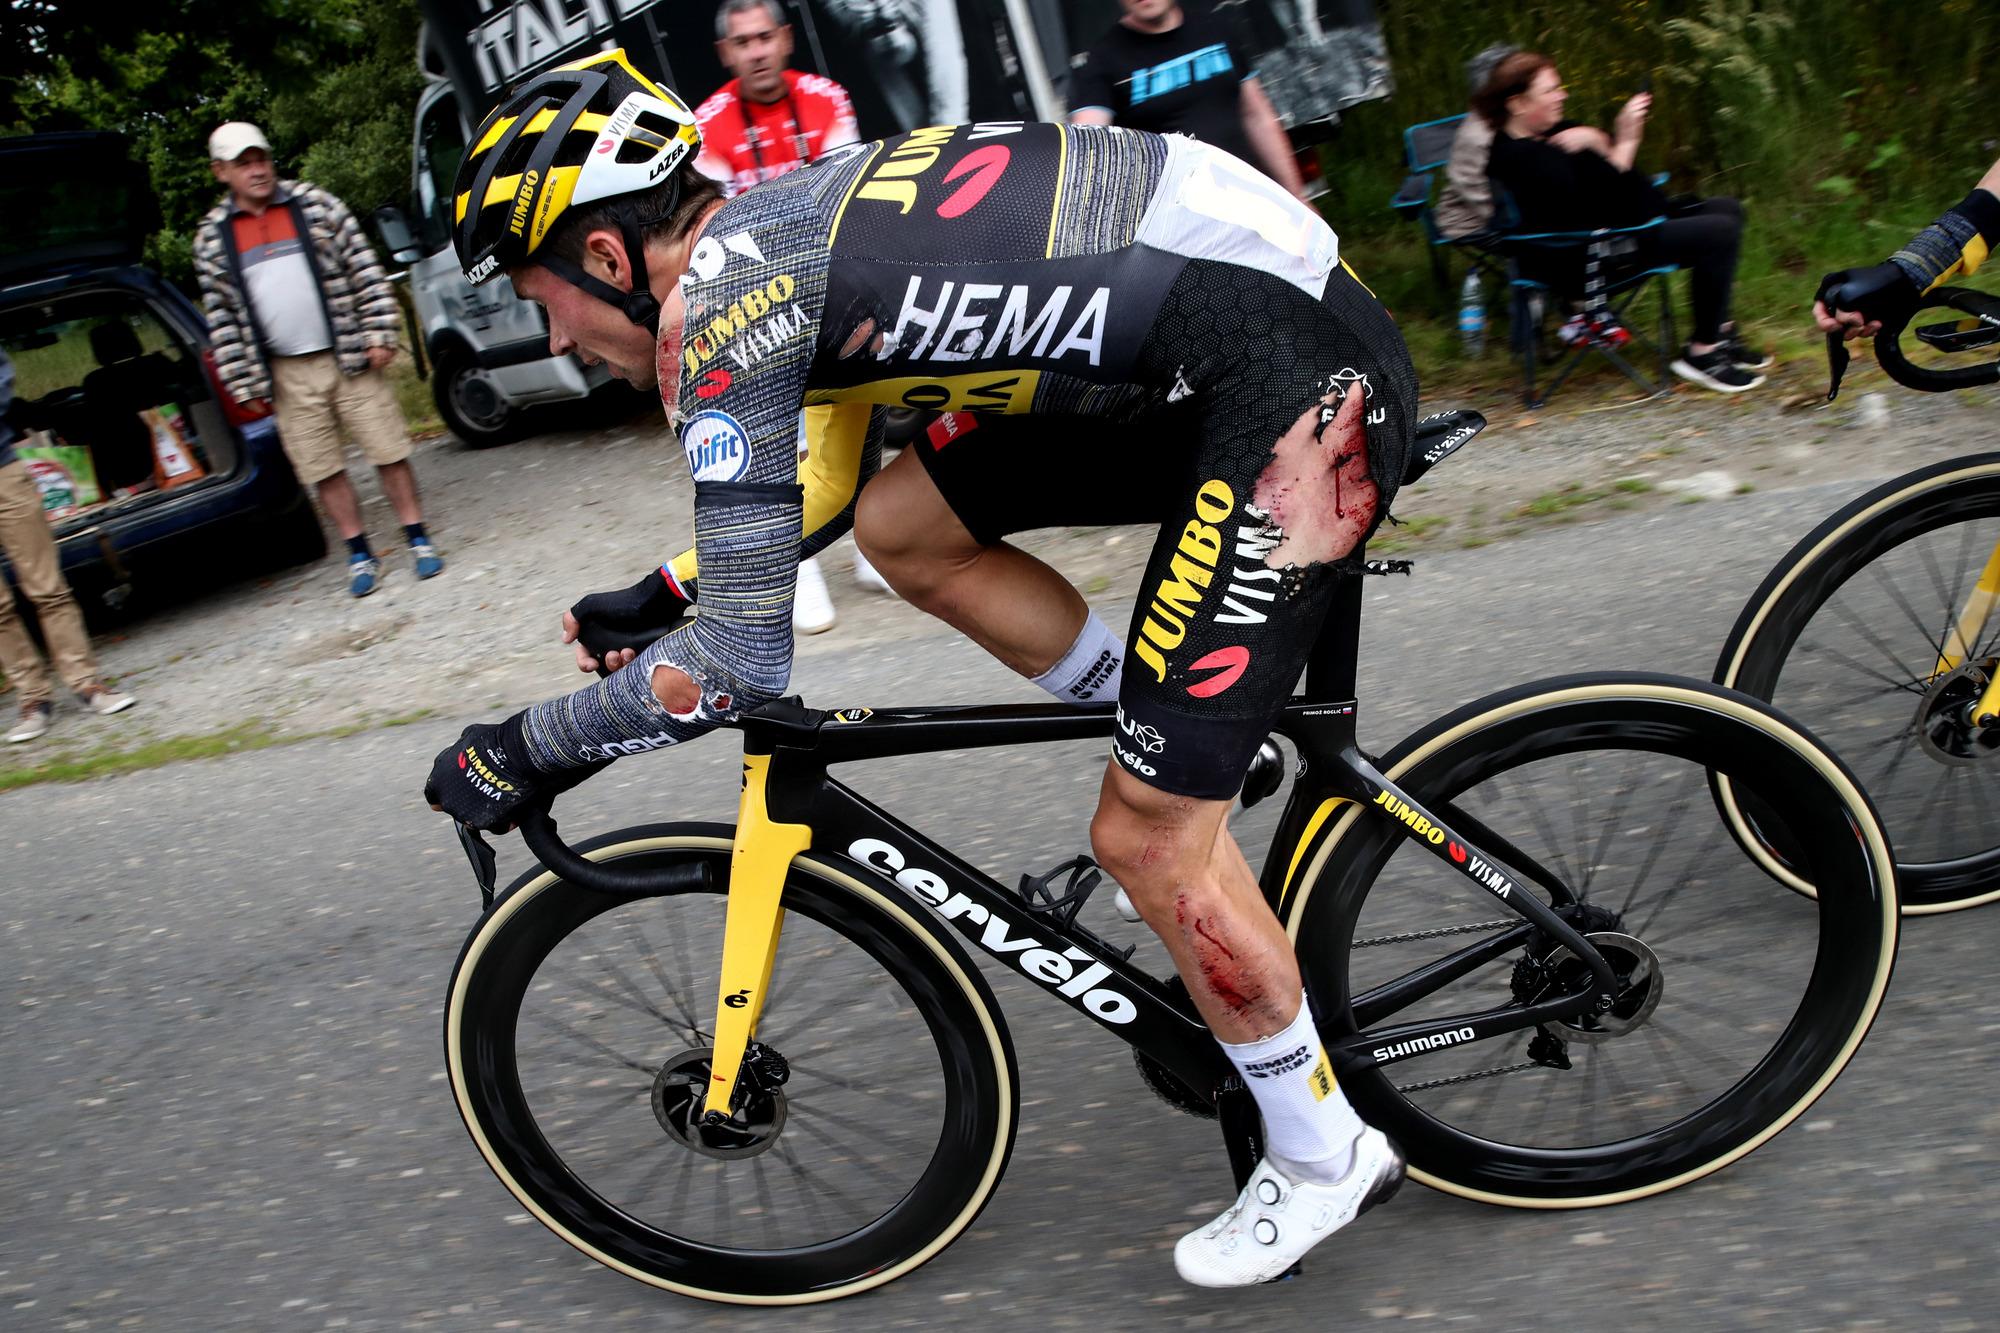 Tour de France 2021 108th Edition 3rd stage Lorient Pontivy 1829 km 28062021 Injury Primoz Roglic SLO Jumbo Visma photo POOL Etienne GarnierBettiniPhoto2021